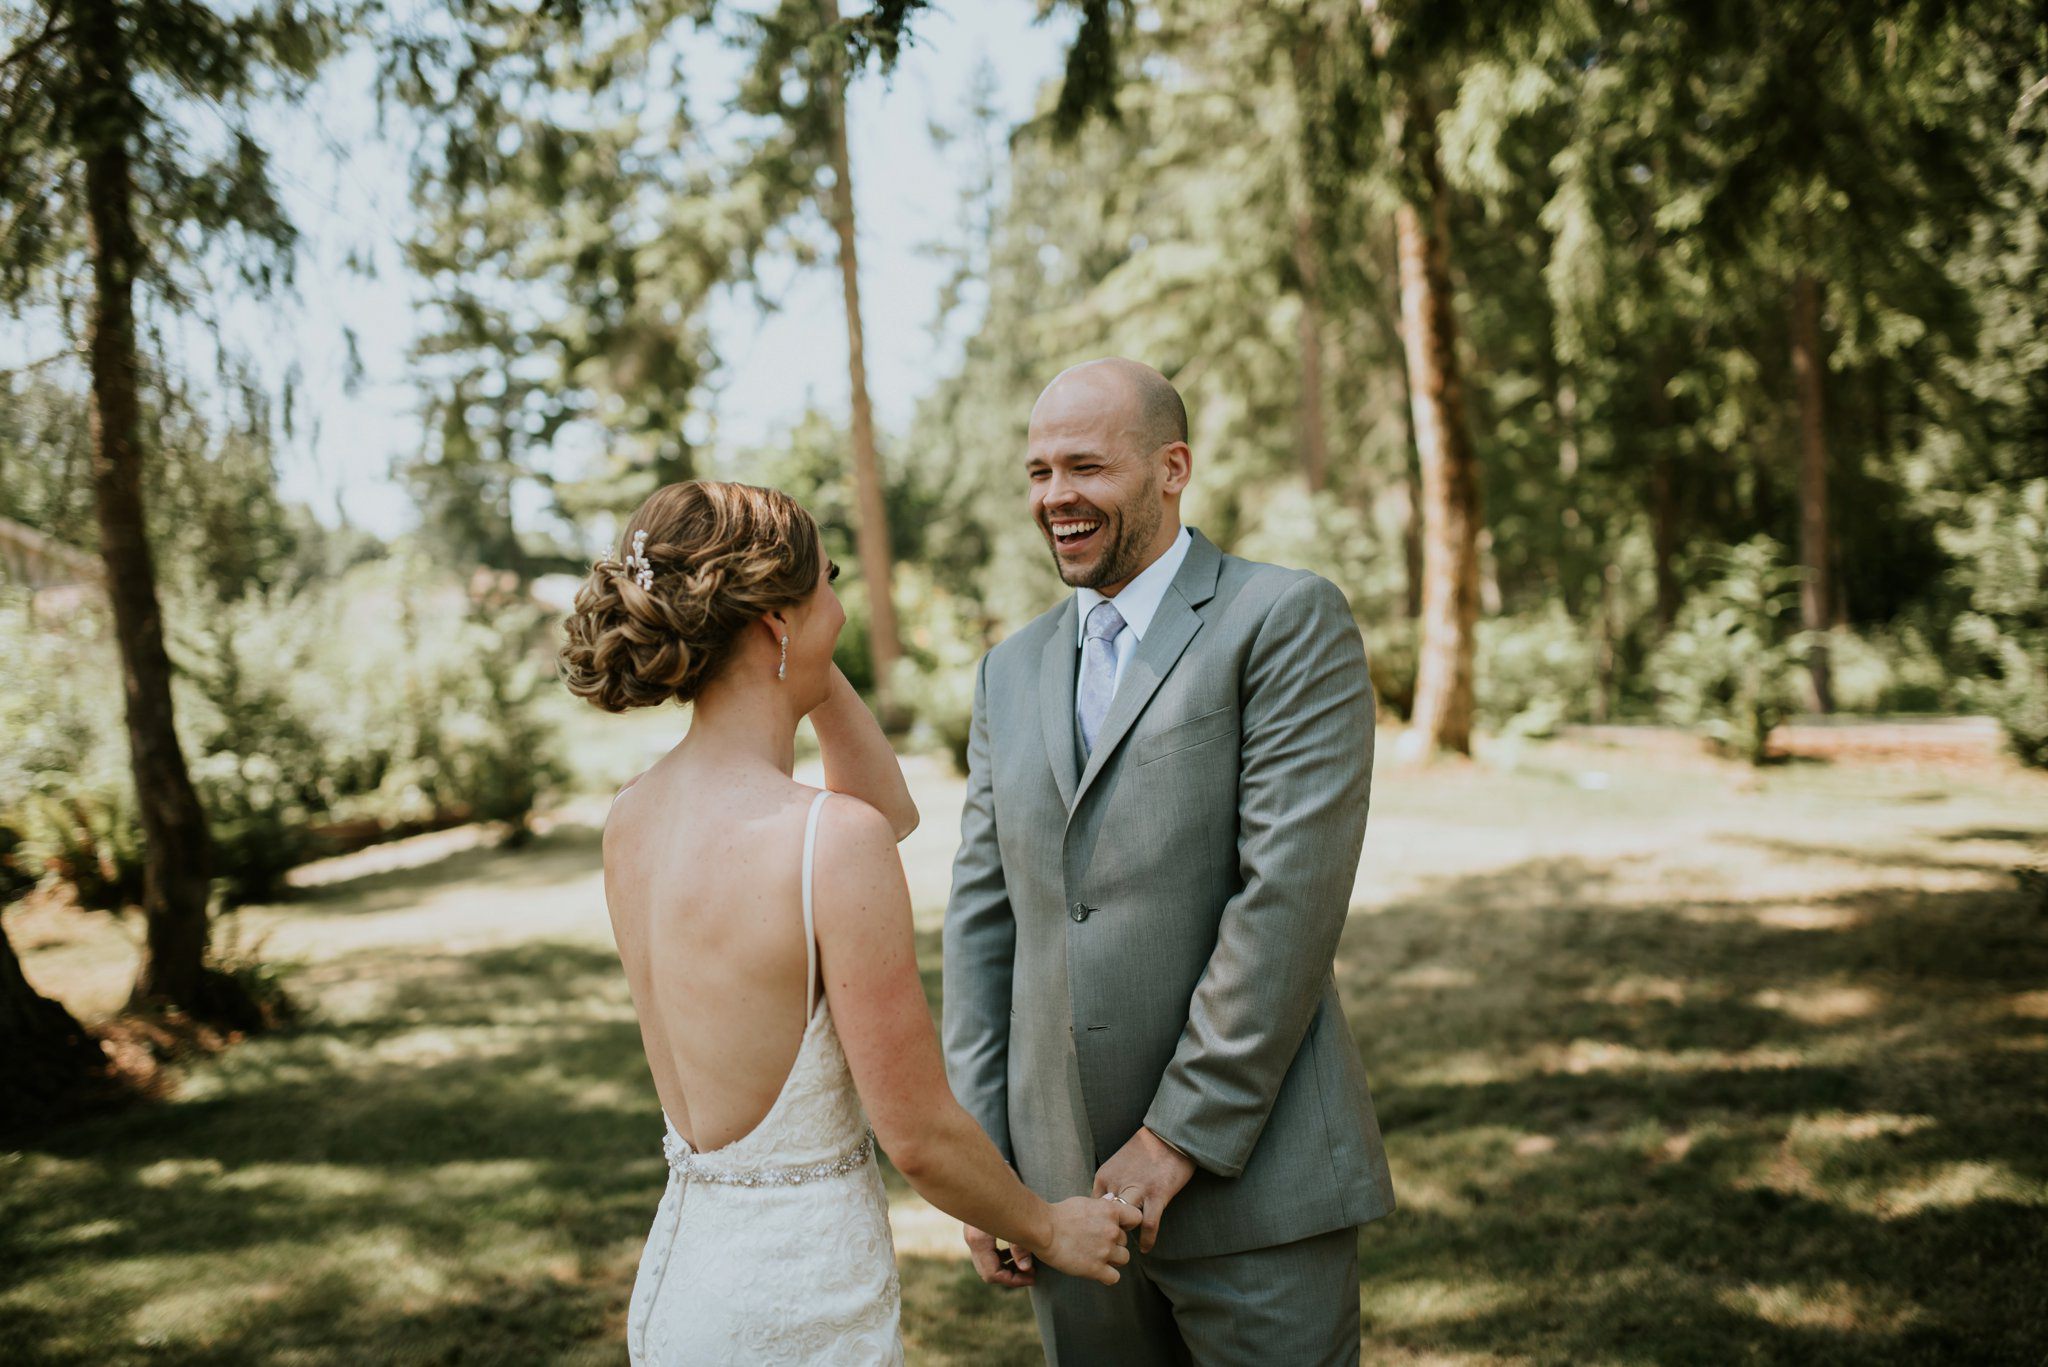 hollywood-school-house-wedding-seattle-photographer-caitlyn-nikula-39.jpg